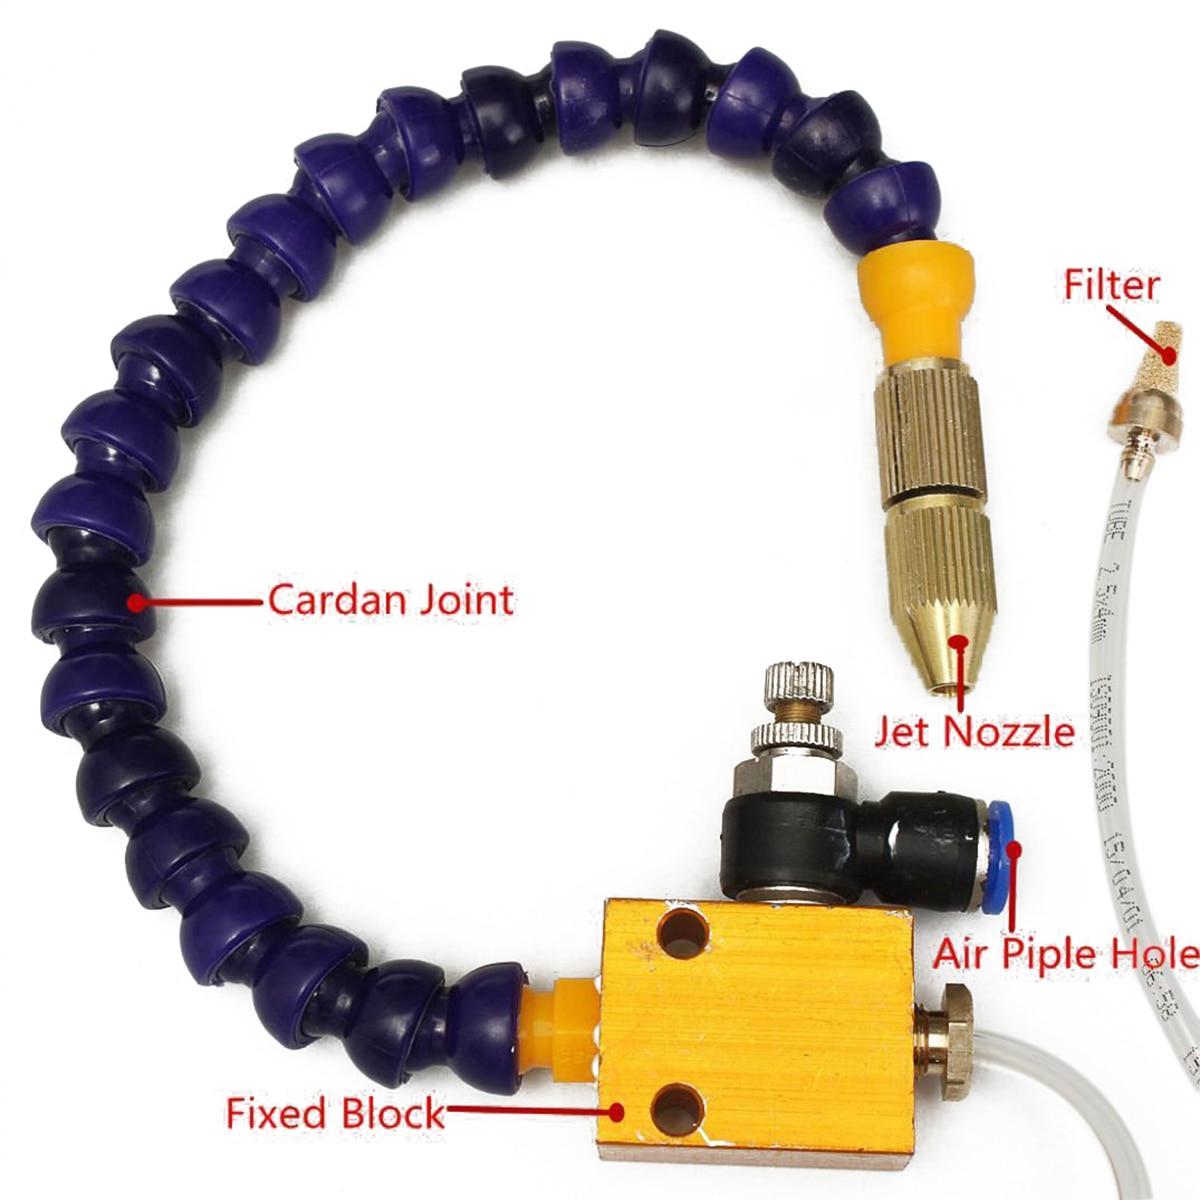 Multi-function Mist Coolant Lubrication Spray System Unit Air Hose Pipe for CNC Lathe Milling Machine Mayitr Coolant Misting genuine 30723084 engine coolant hose